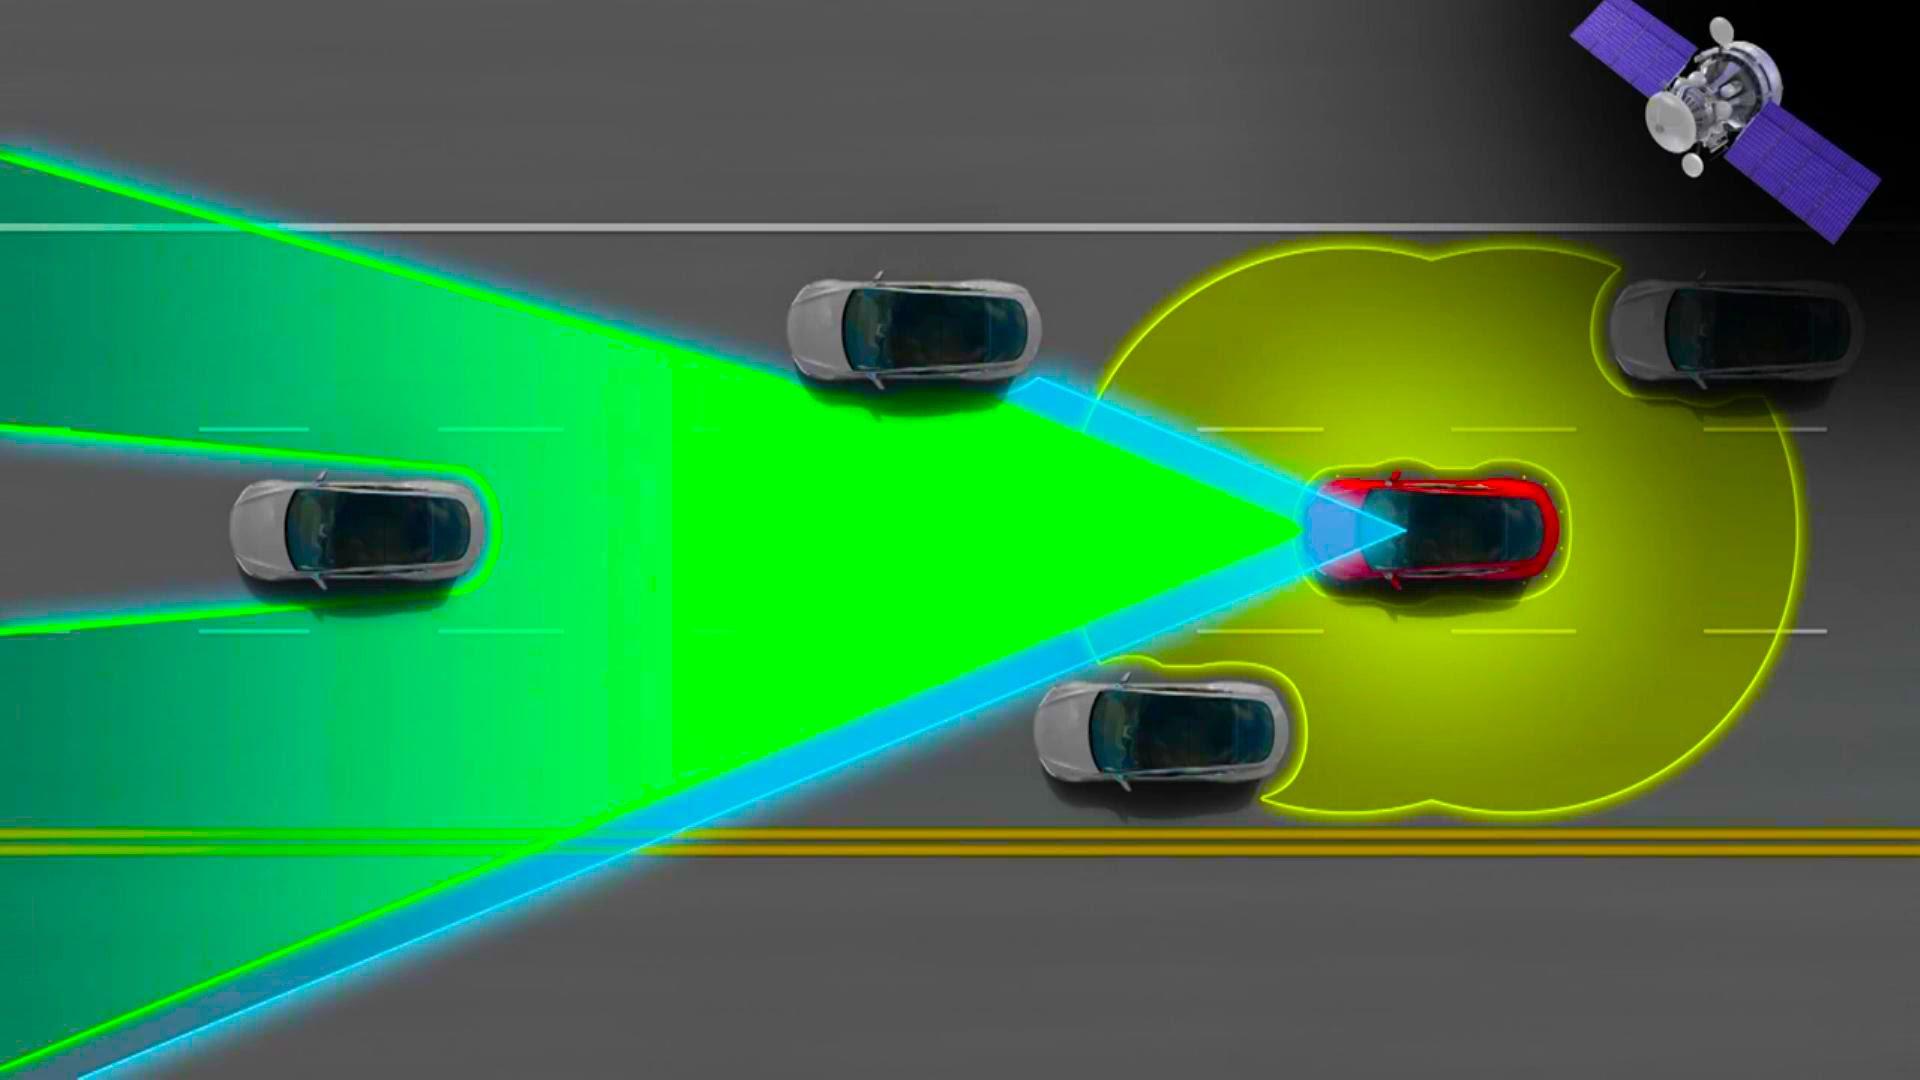 Tesla Sensors Diagram Web About Wiring Model S Introduces Revolutionary Auto Pilot Features For Rh Sagmart Com Coil Schematic